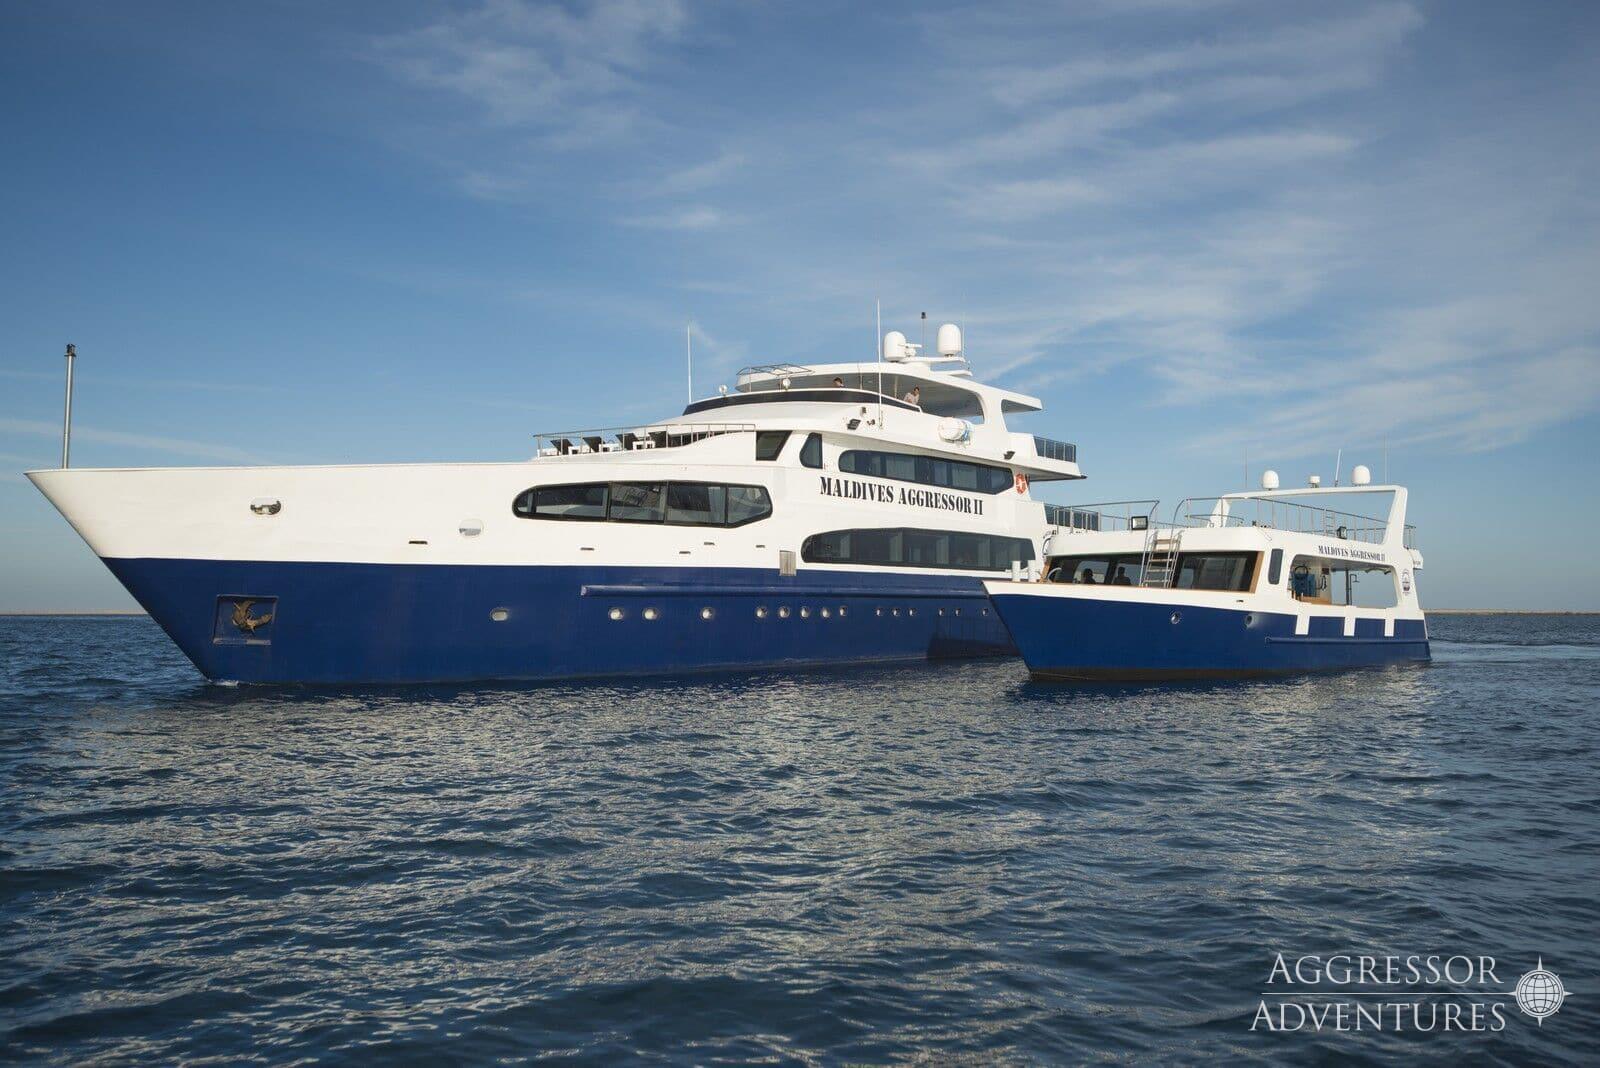 Maldives Aggressor II liveaboard trip